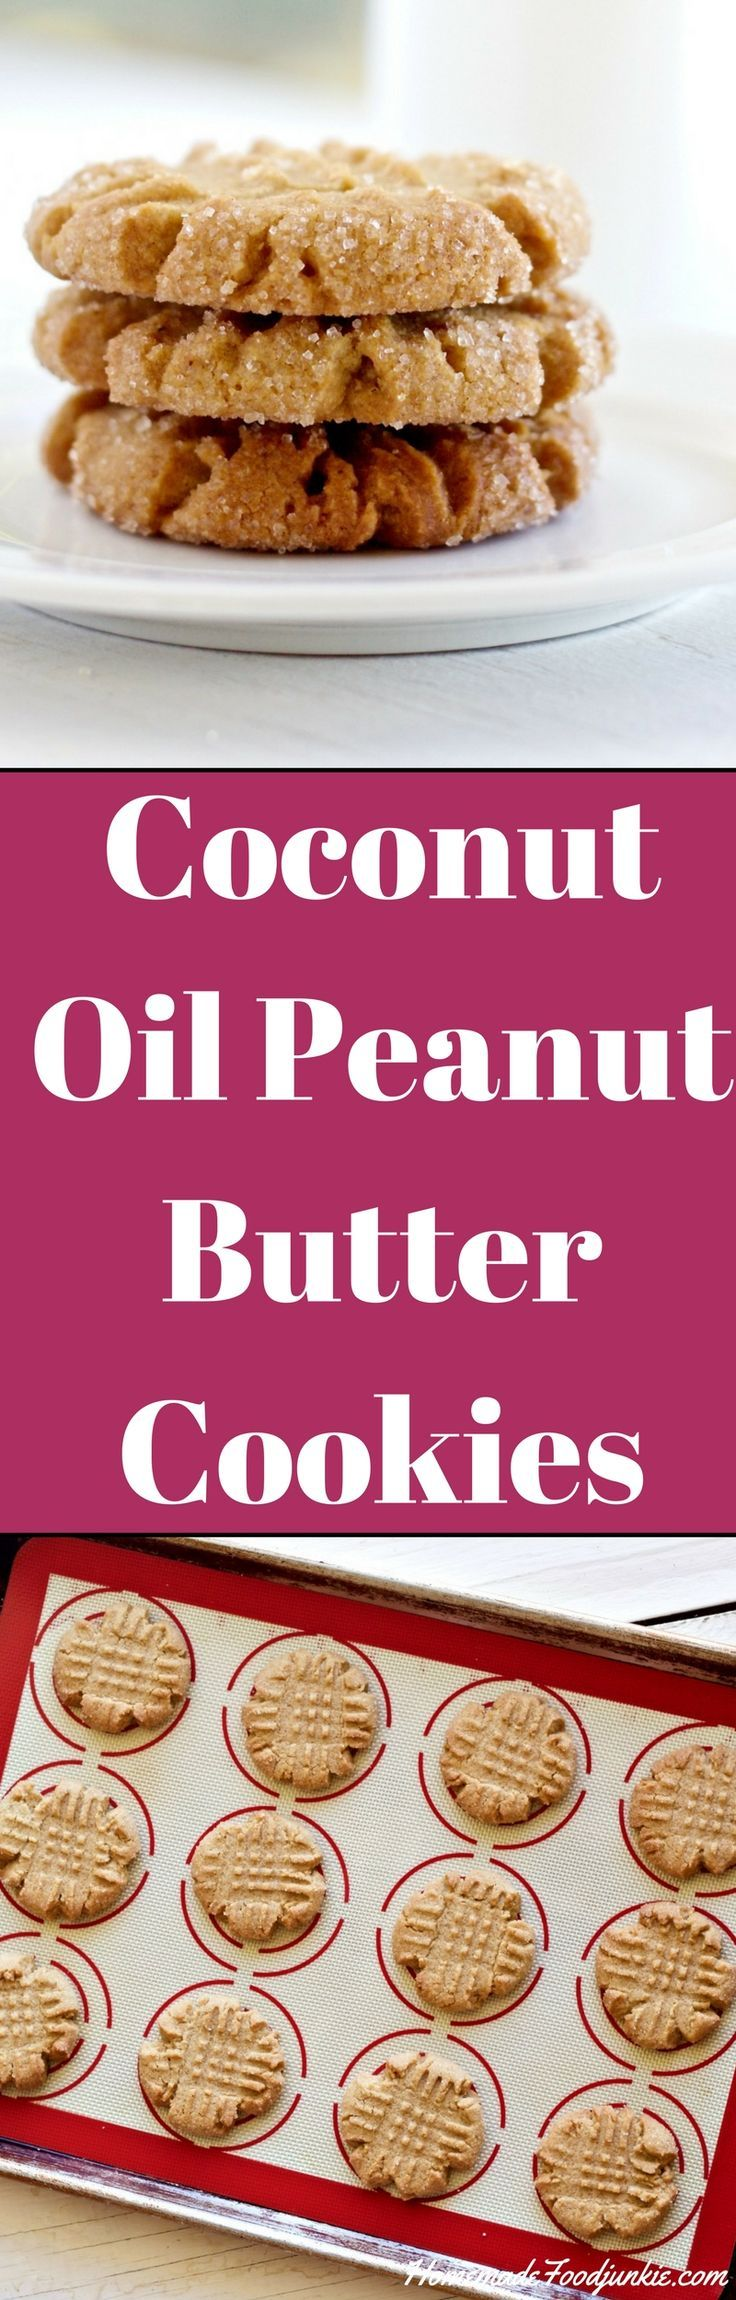 Coconut Oil Peanut Butter Cookies America's favorite cookie-Dairy free!